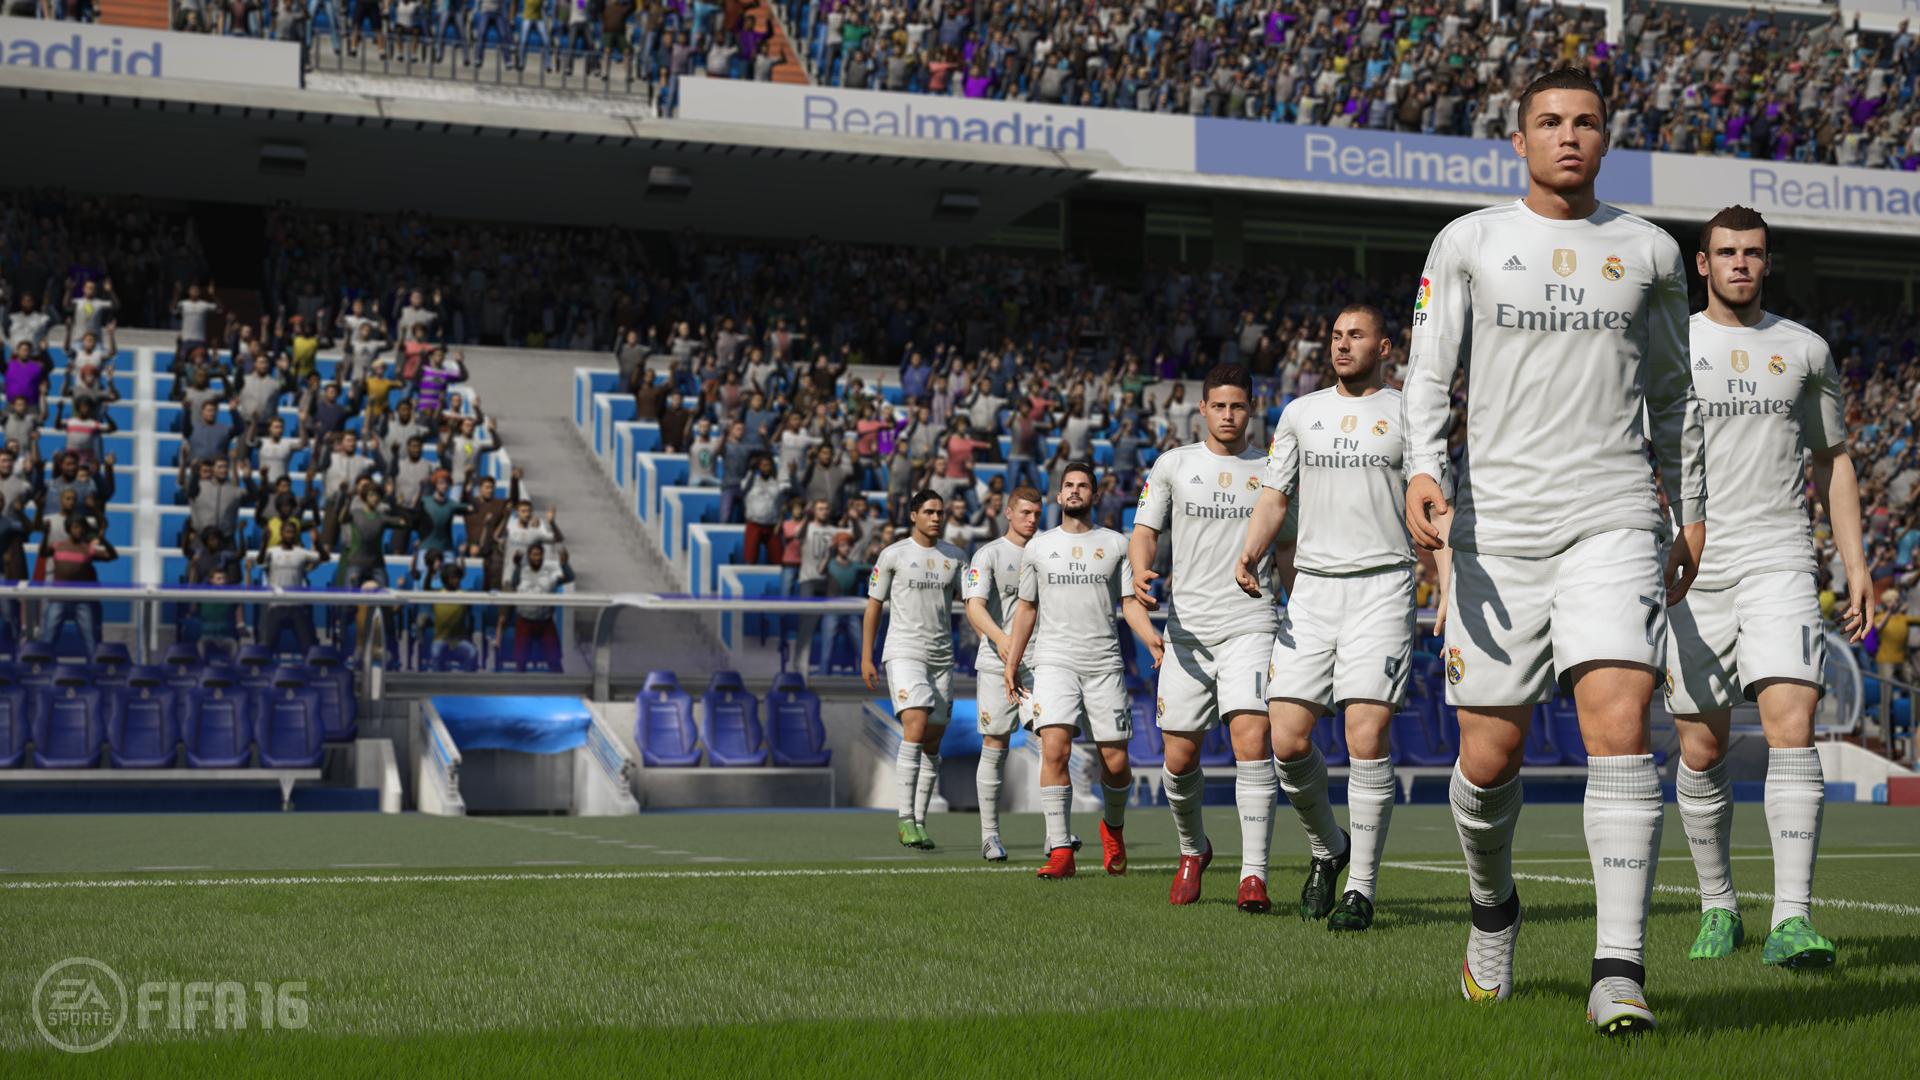 FIFA16_XboxOne_PS4_RealMadridAnnounce_Walkout_LR_WM